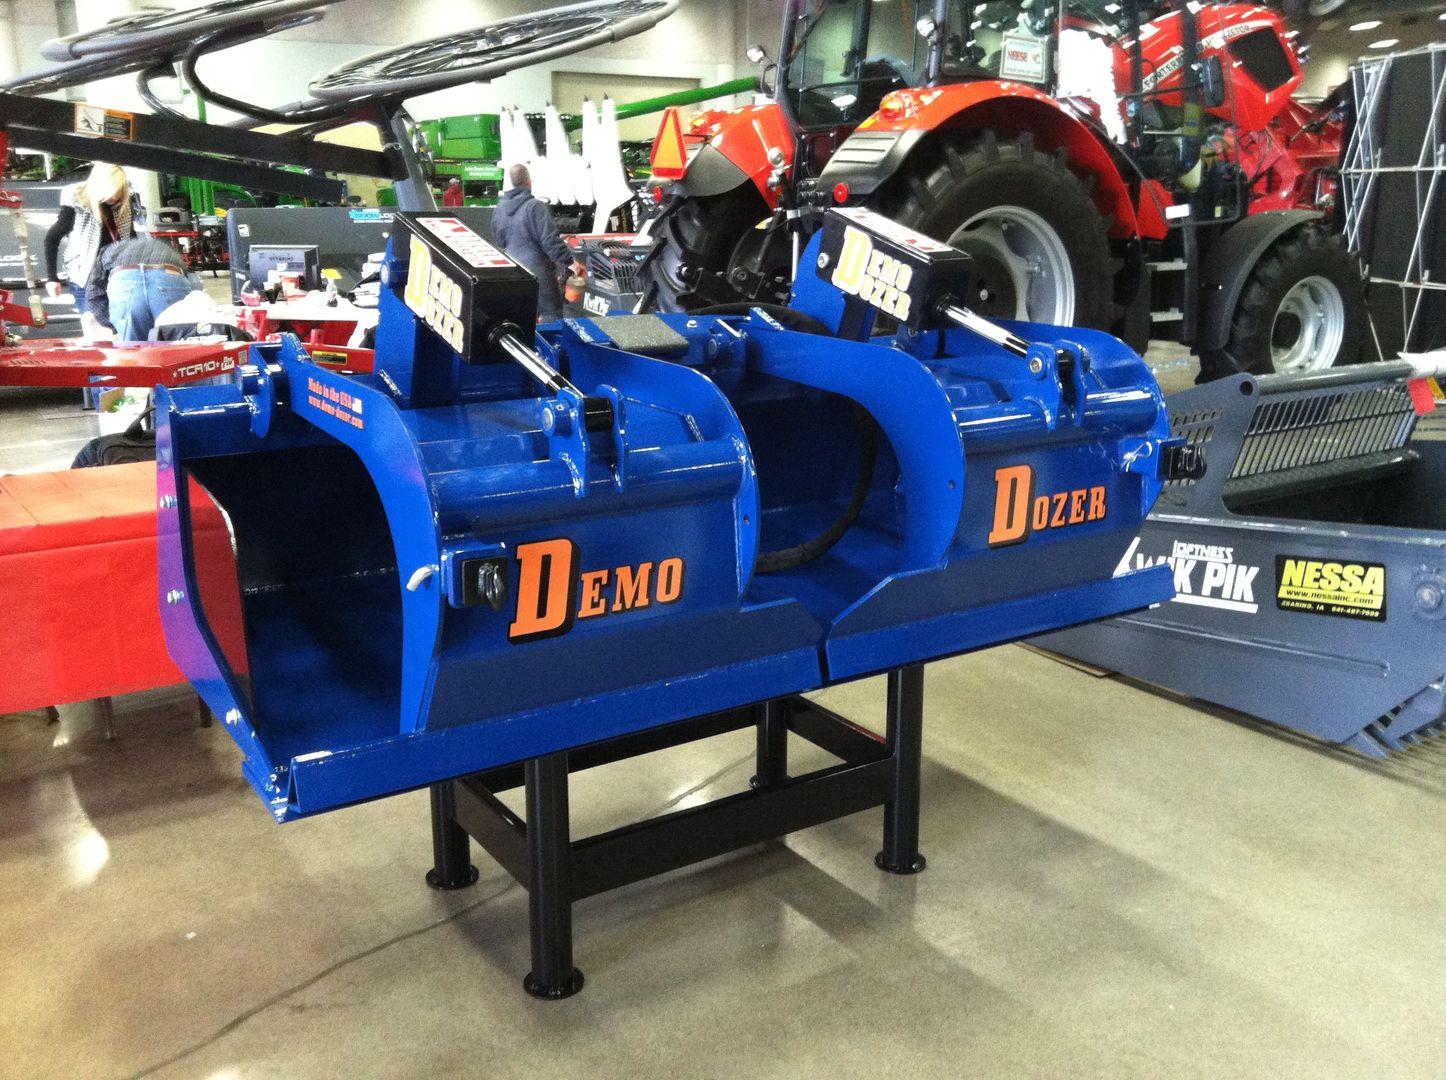 john waddington jr skid steer attachments for sale demo dozer